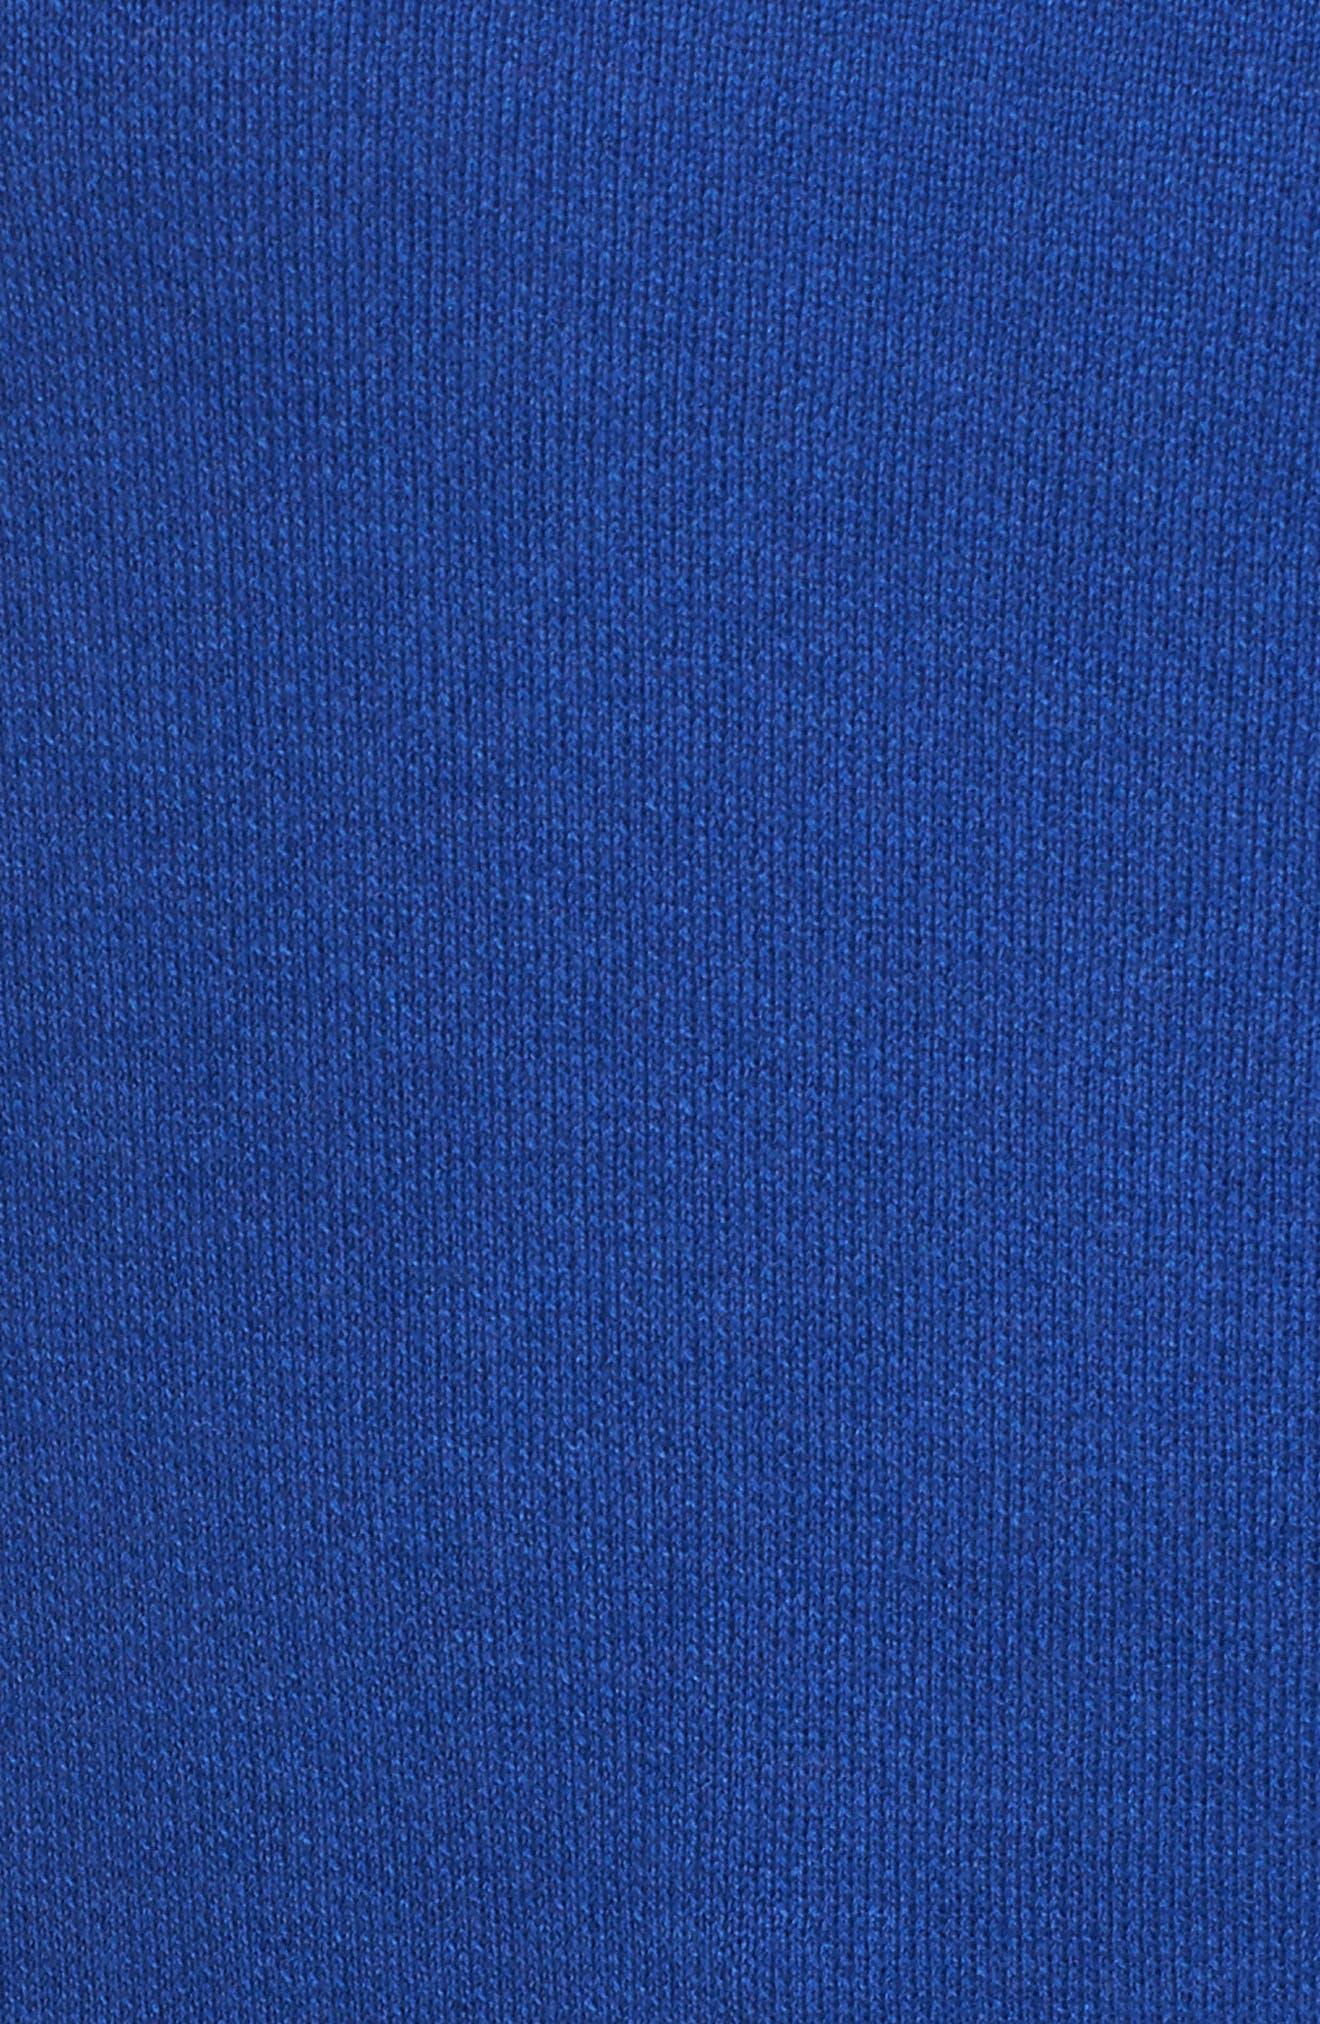 Dolman Sleeve Crewneck Sweater,                             Alternate thumbnail 5, color,                             Blue Mazarine